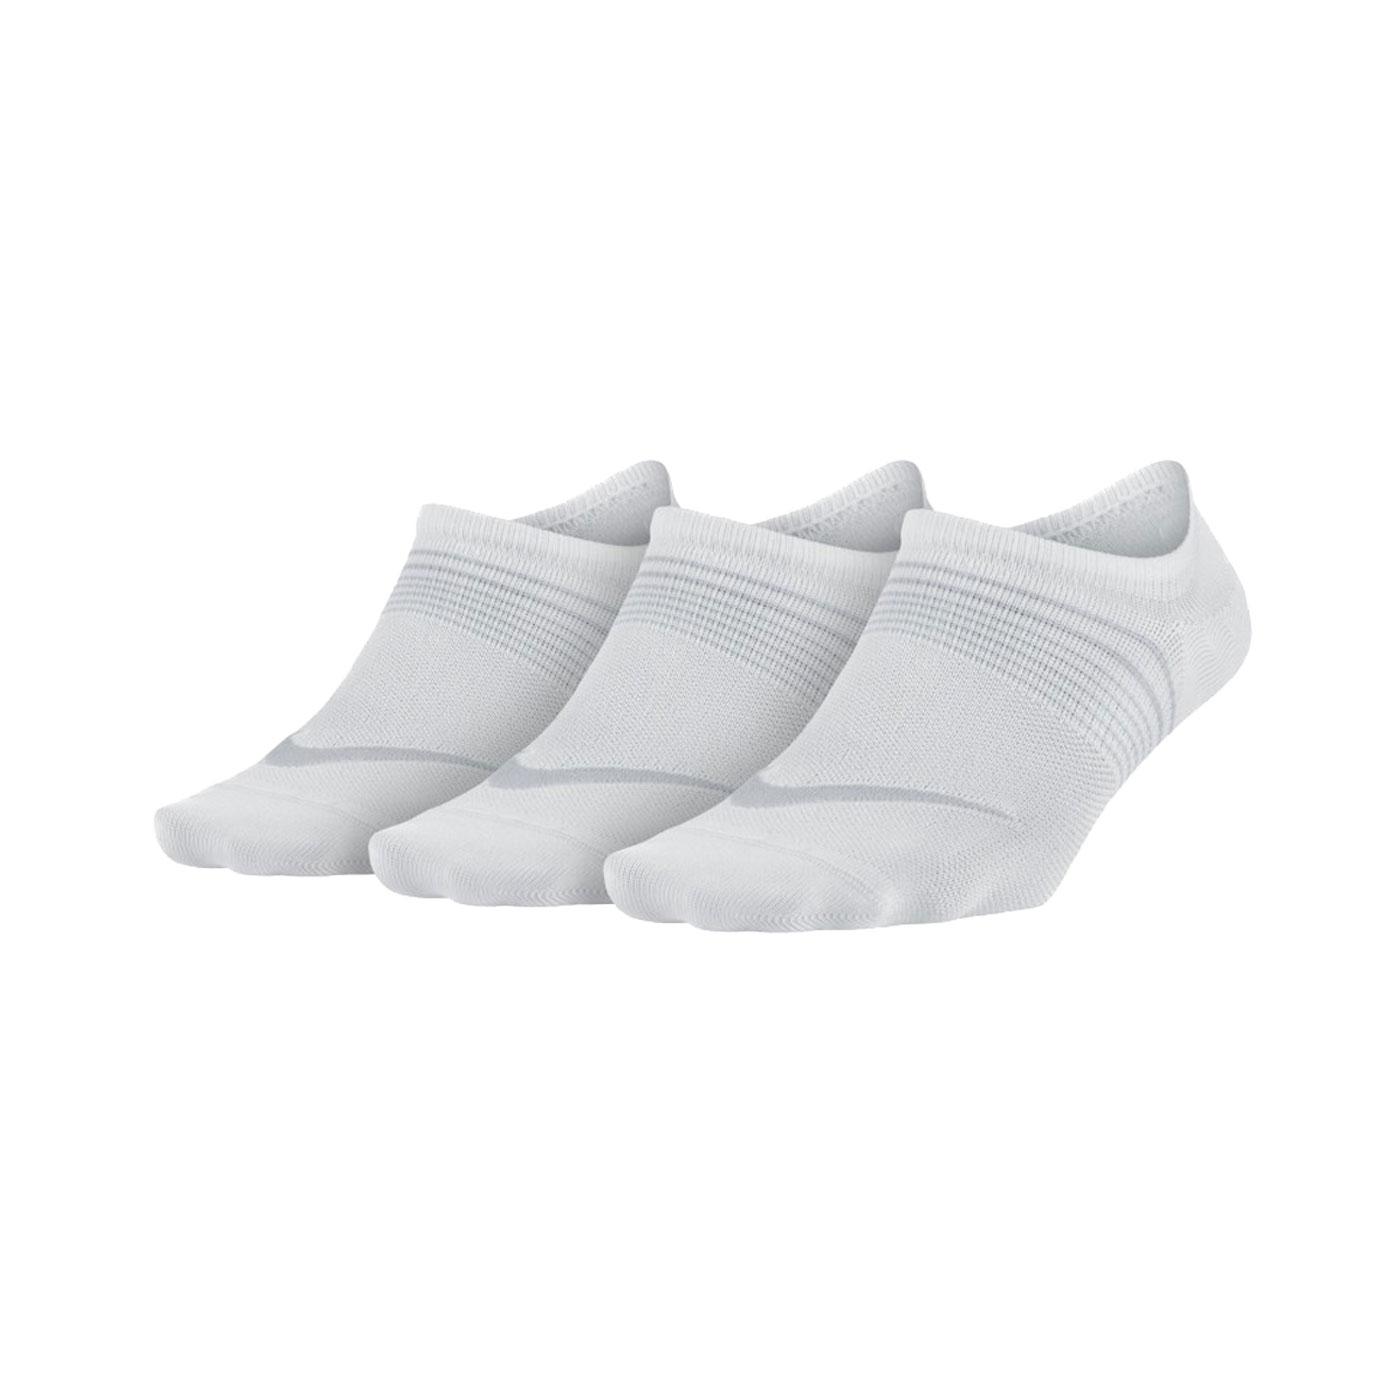 NIKE 三包女子輕質訓練襪 SX5277-100 - 白灰